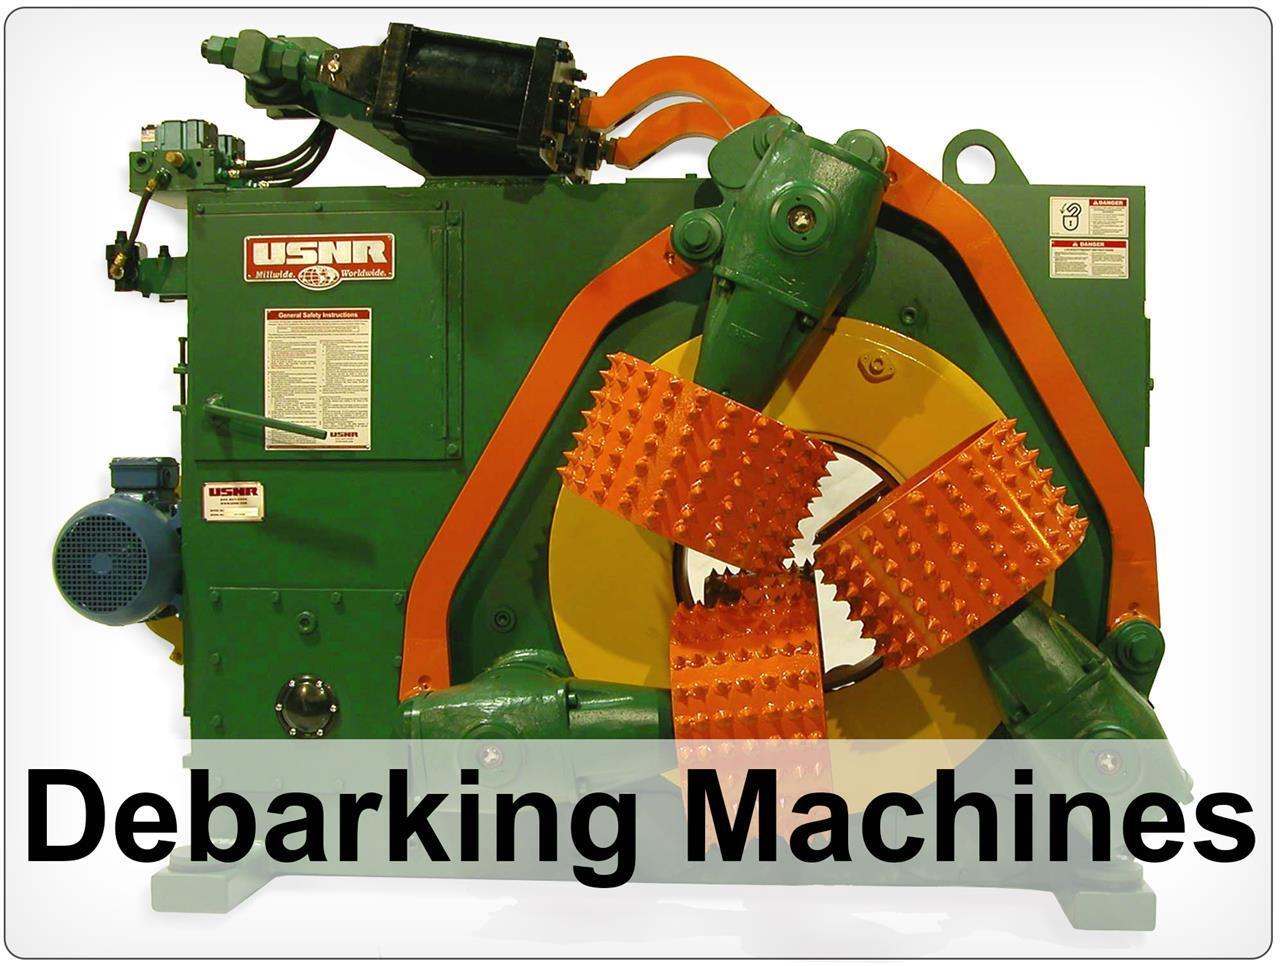 Rebuilt Cambio Debarking machine